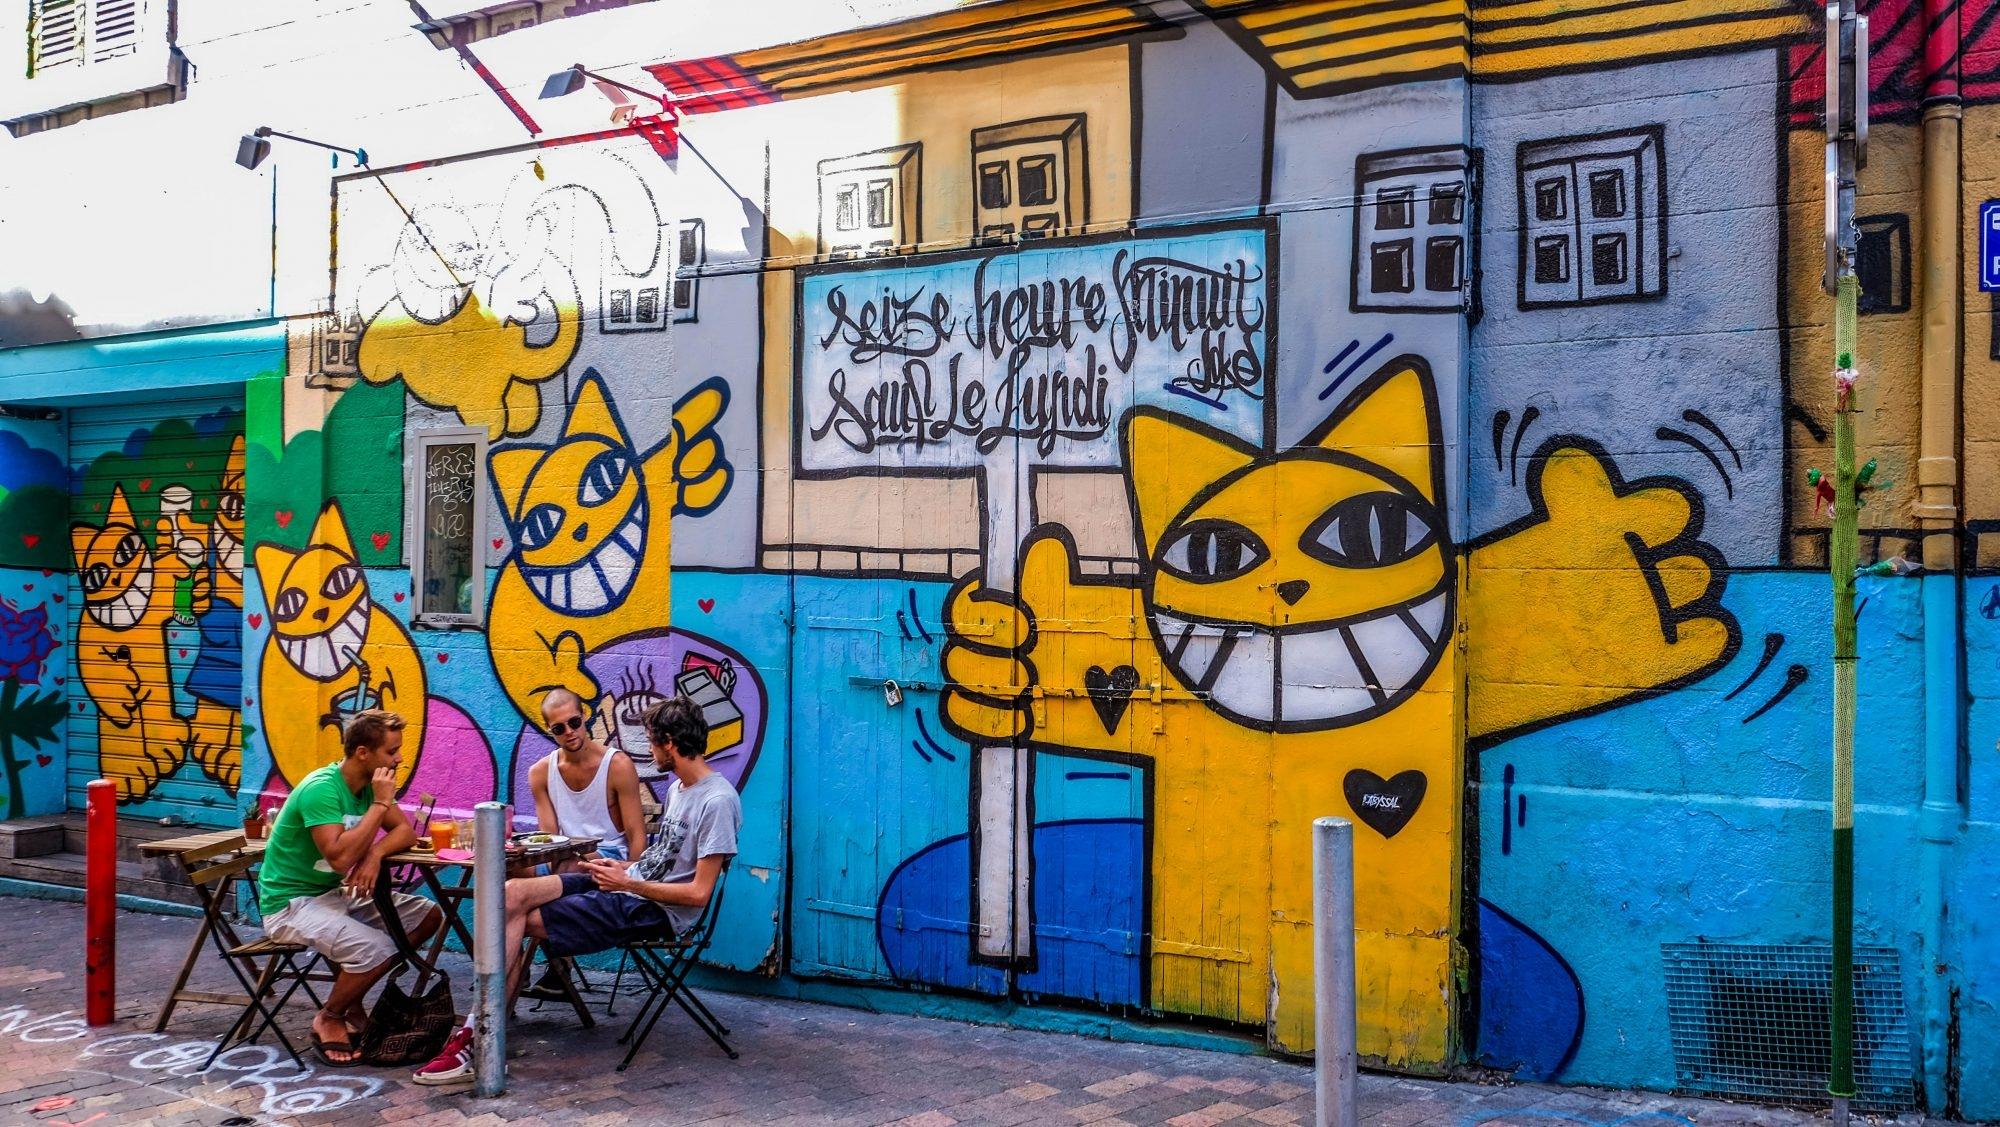 Monsieur Chat Street Art Cour Julien Marseille